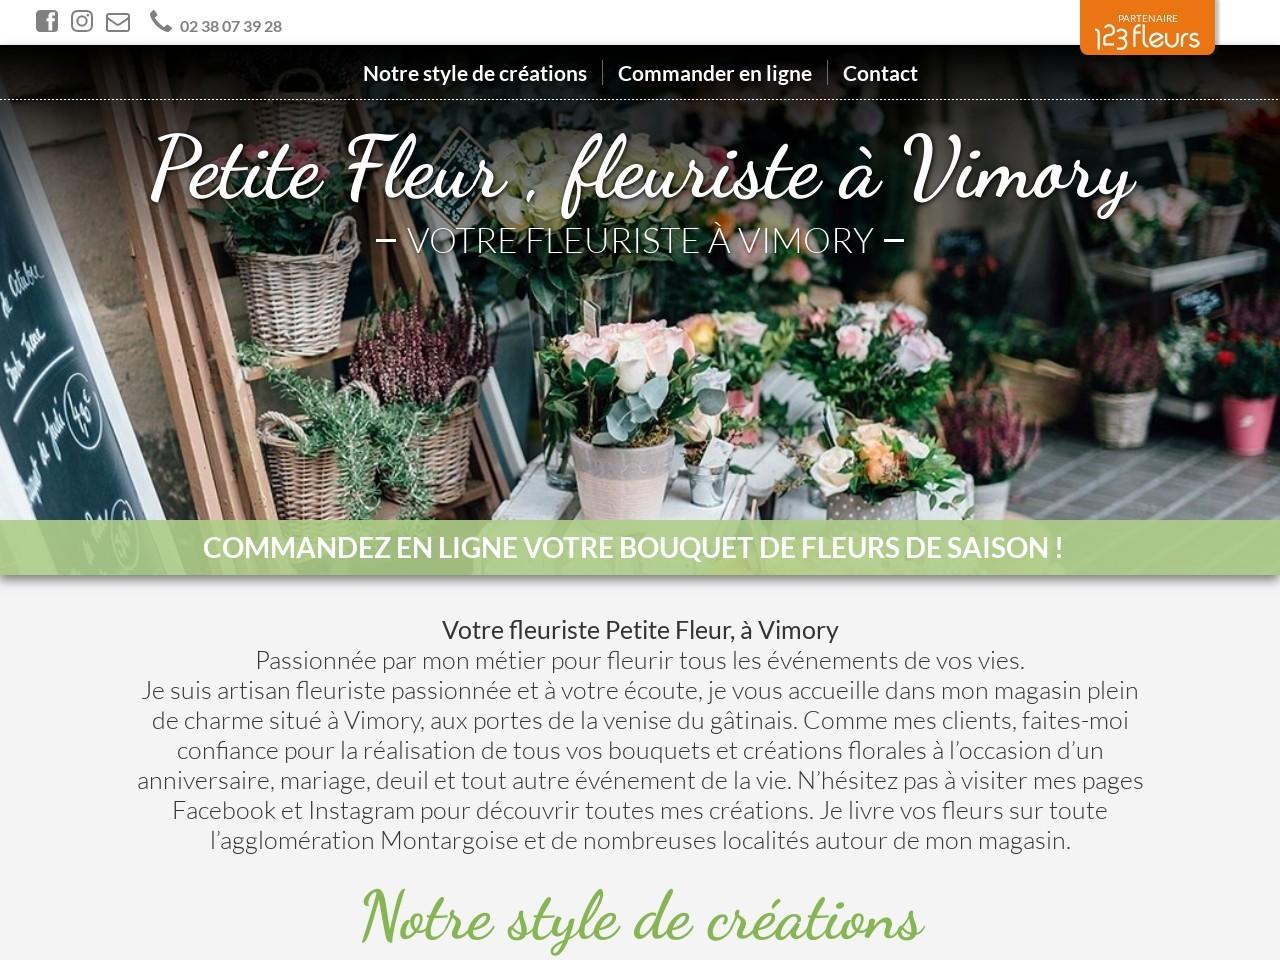 Site fleuriste Petite Fleur - 123fleurs